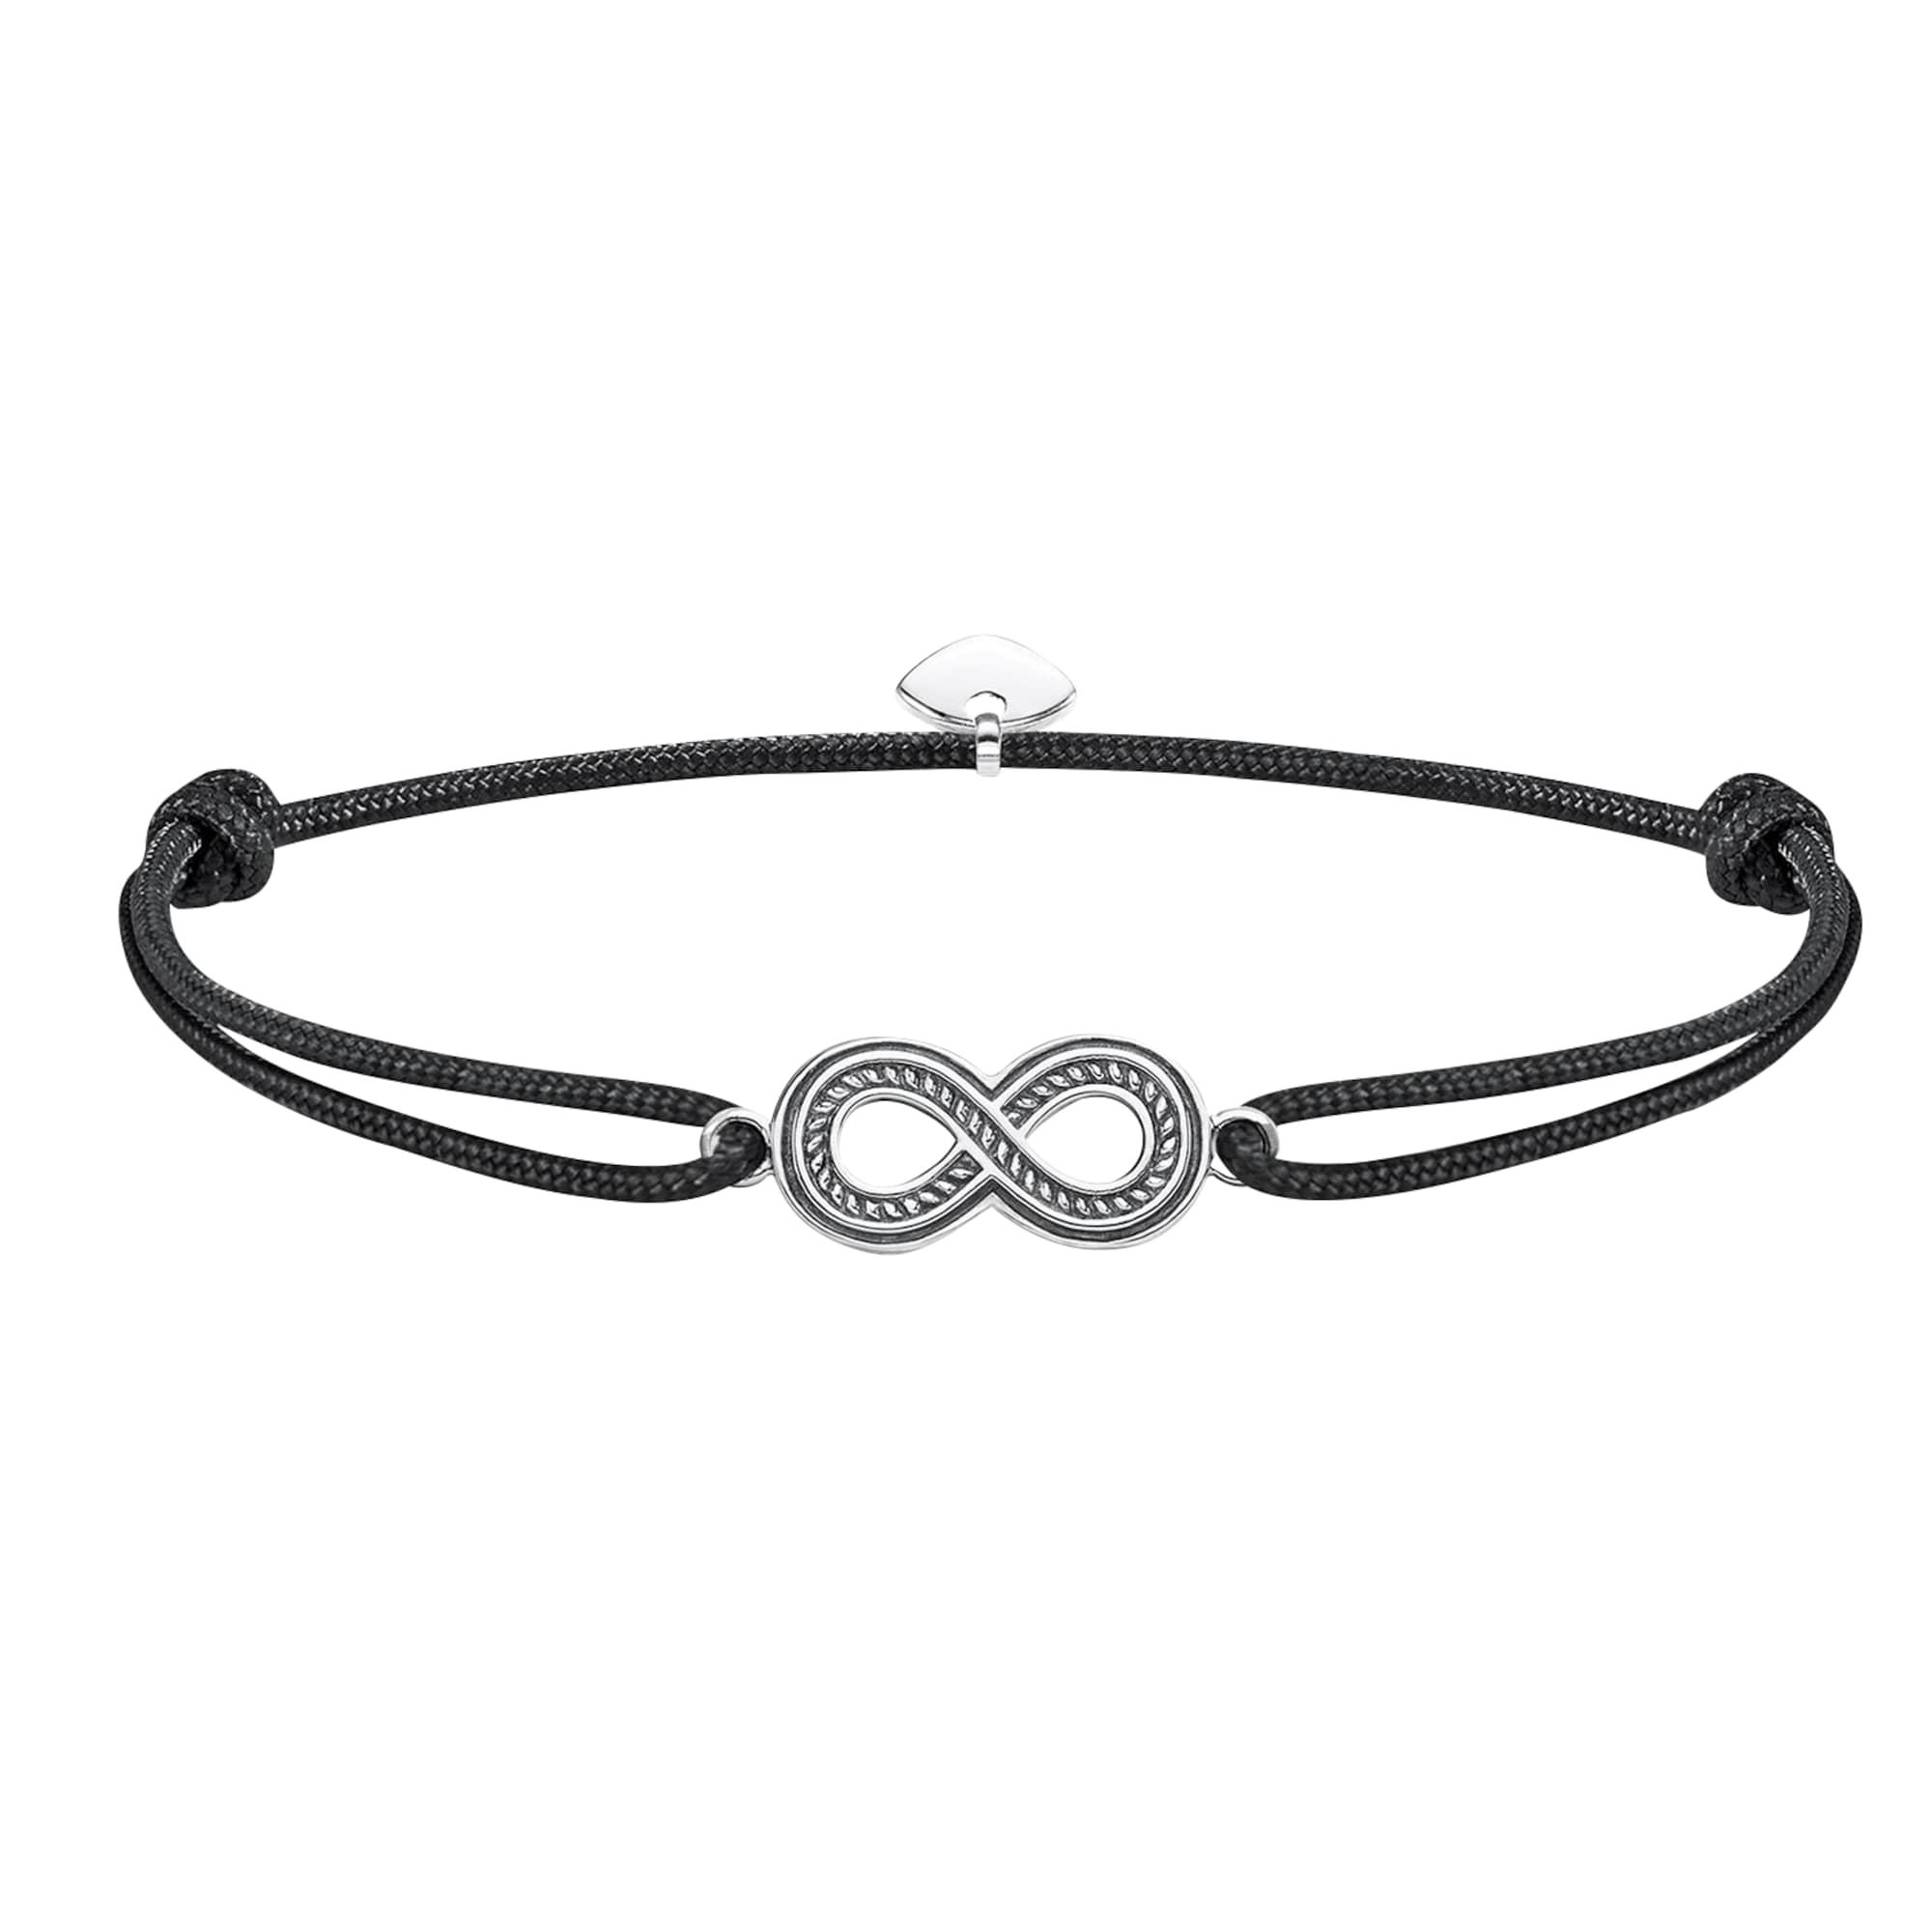 Náramek Little Secret Infinity černá stříbrná Thomas Sabo